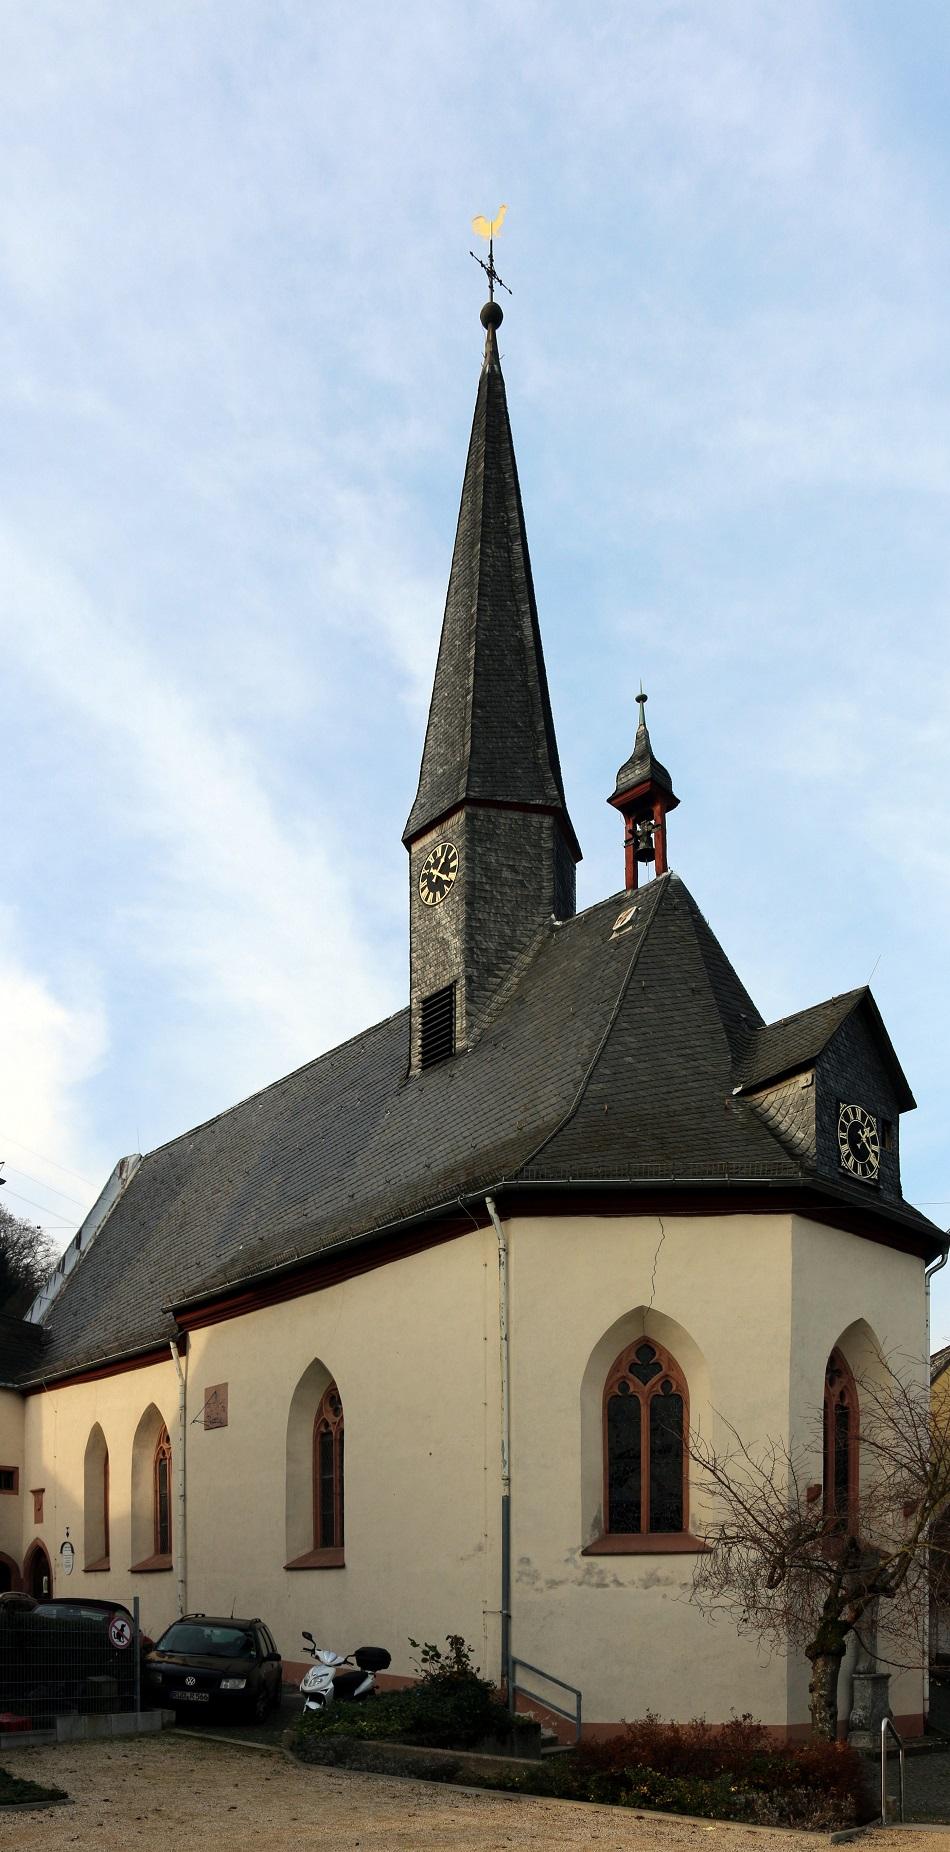 Martinsthal, St. Laurentius und St. Sebastianus (Bild: Oliver Abels, CC BY SA 3.0, 2014)